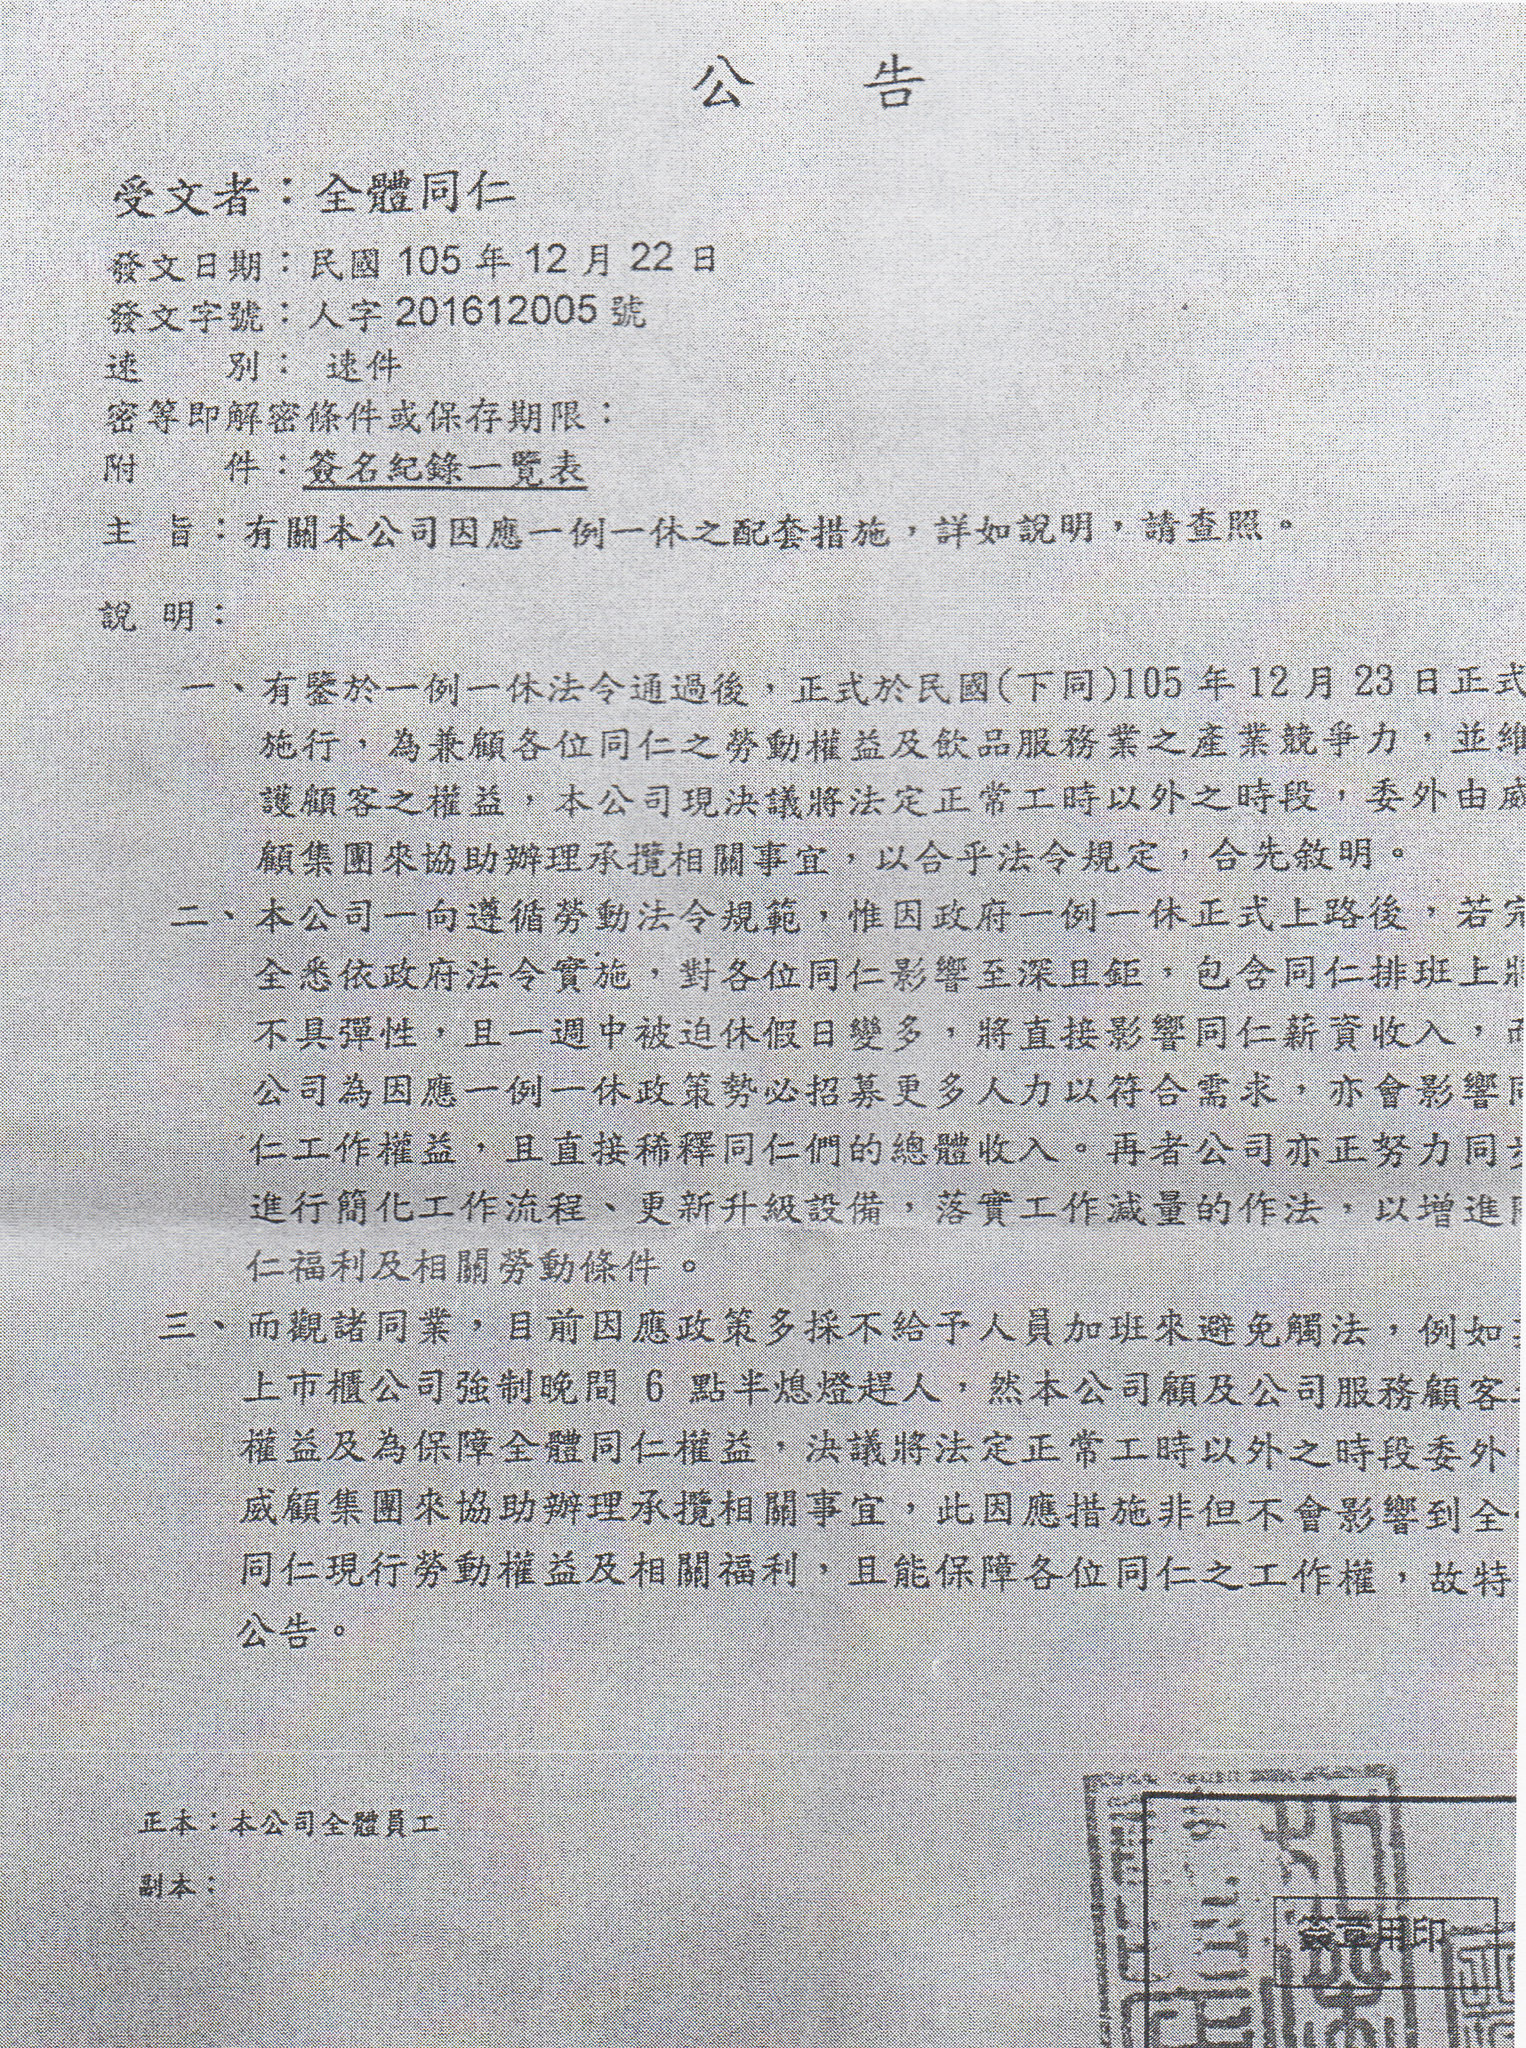 COMEBUY外包加班工時的公告。(資料提供:台灣工人先鋒協會)